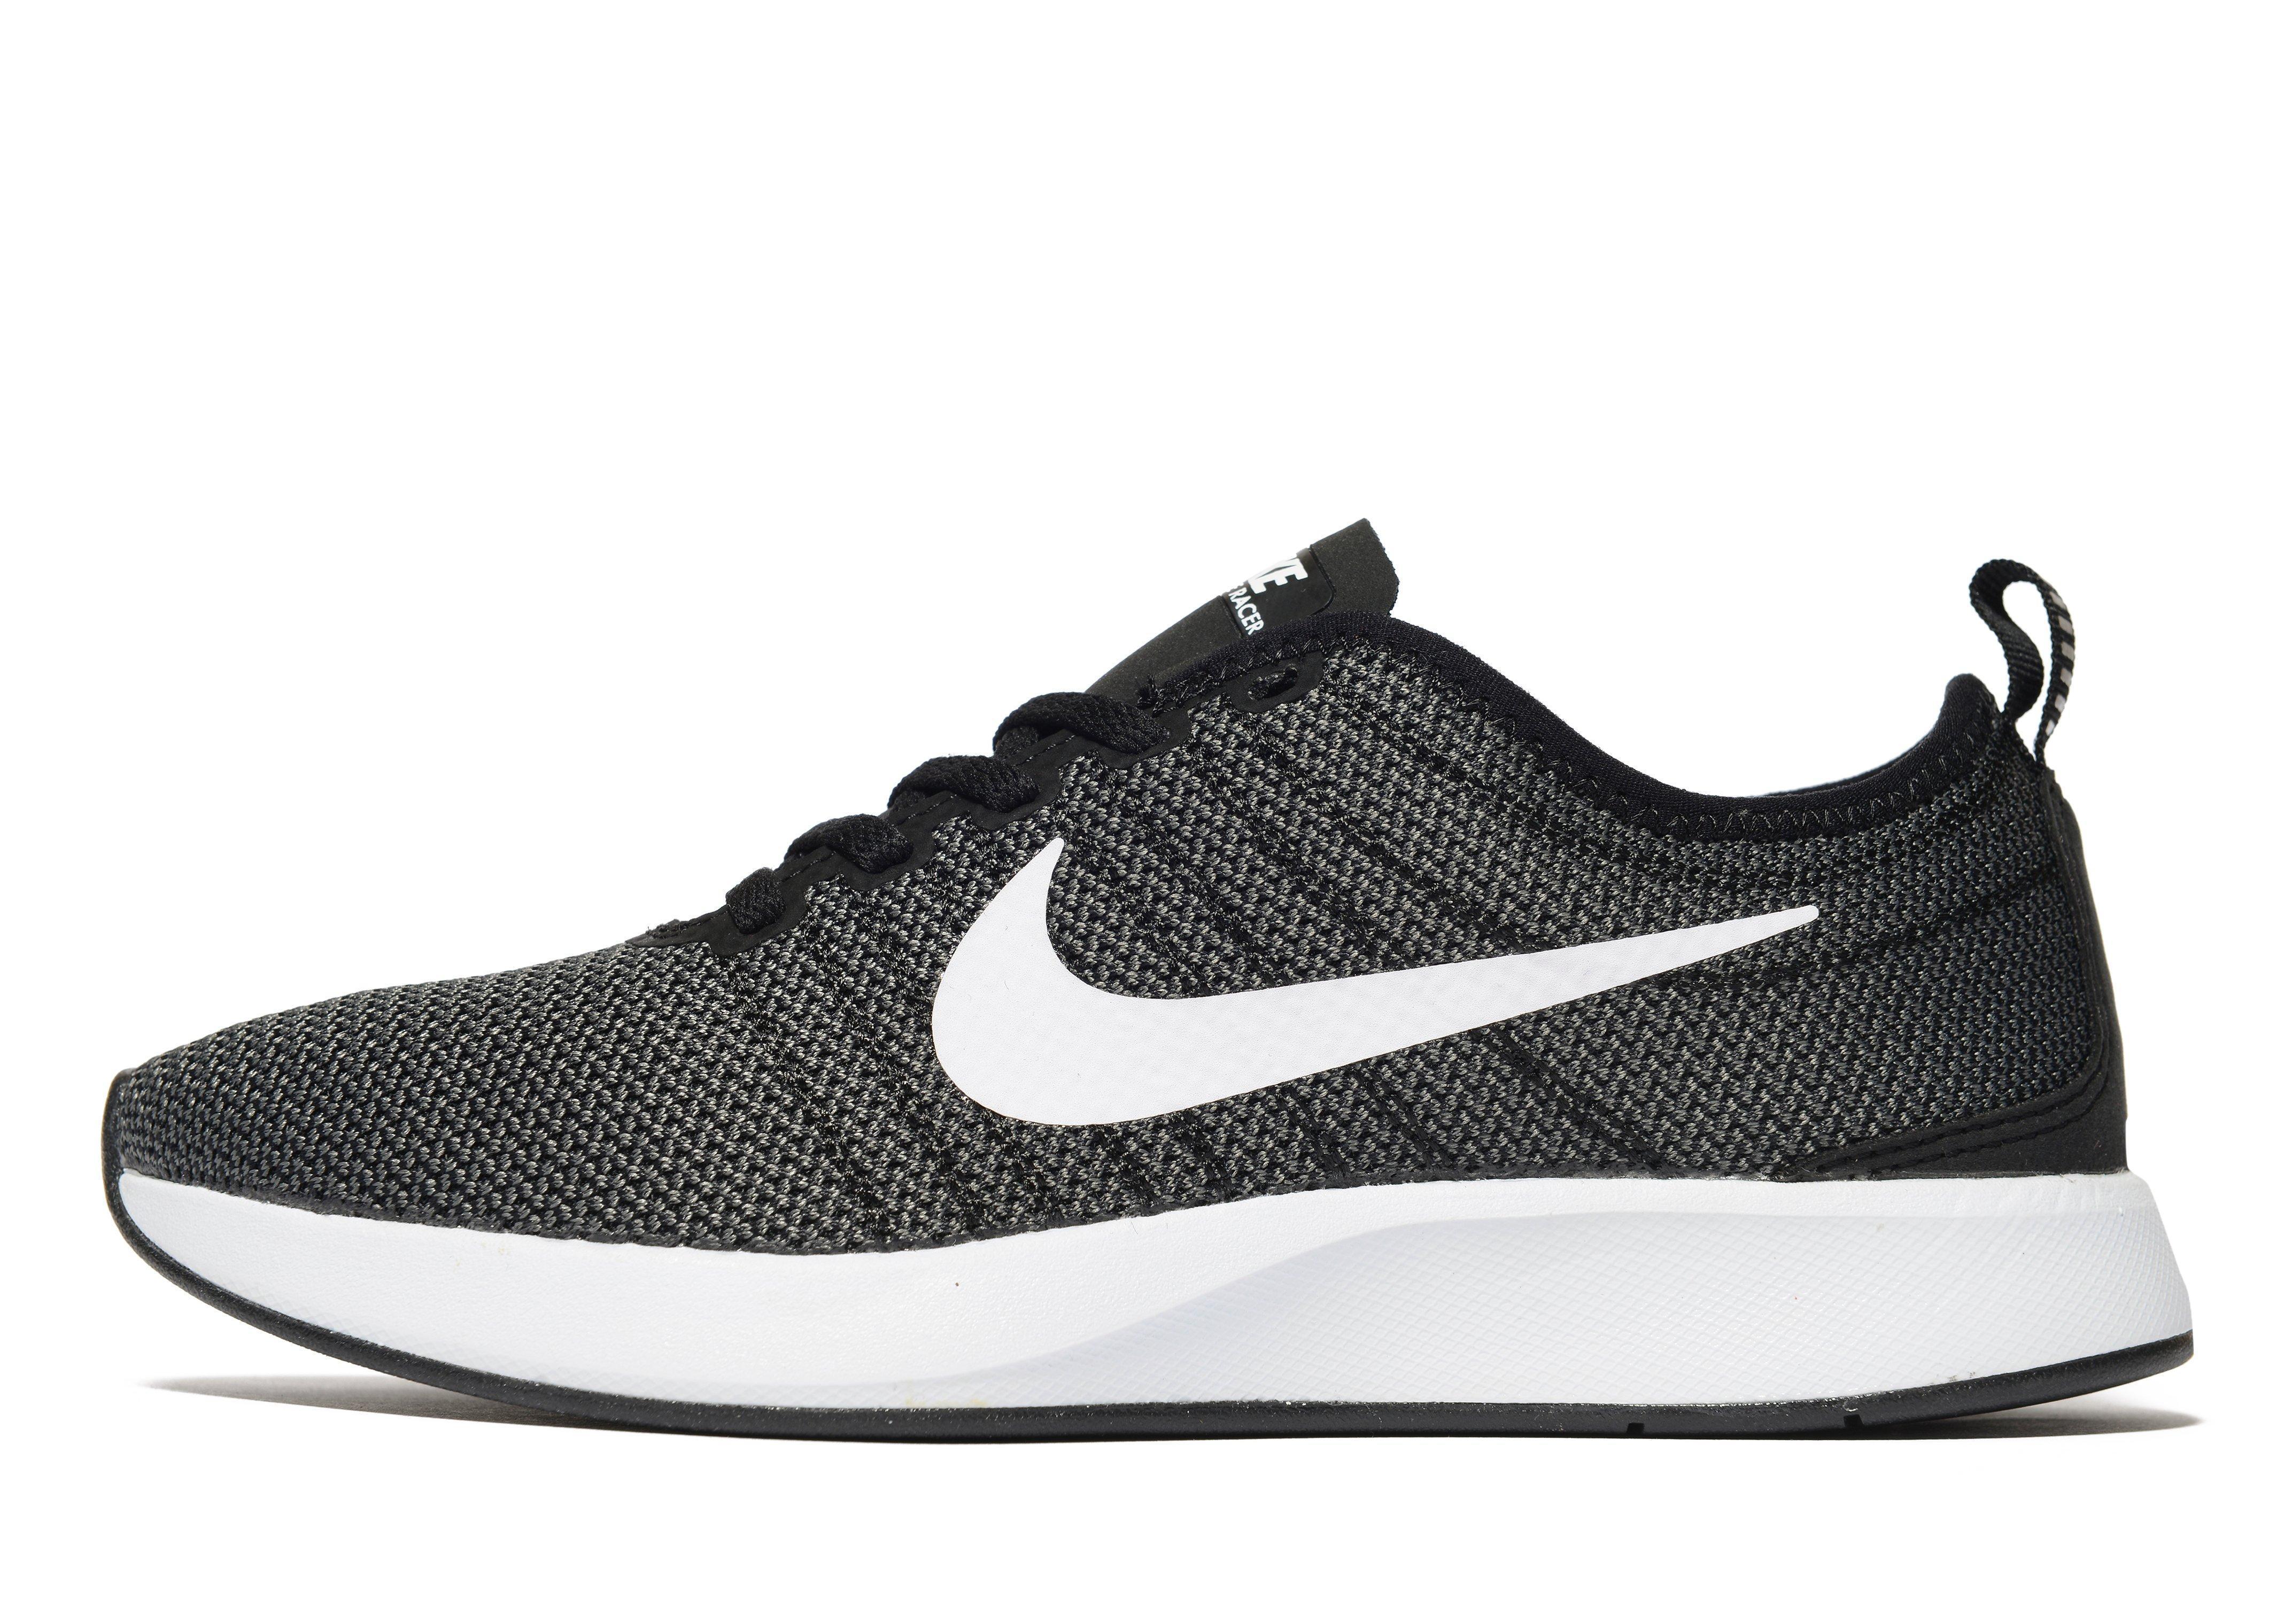 Nike Dualtone Racer in Black for Men - Lyst